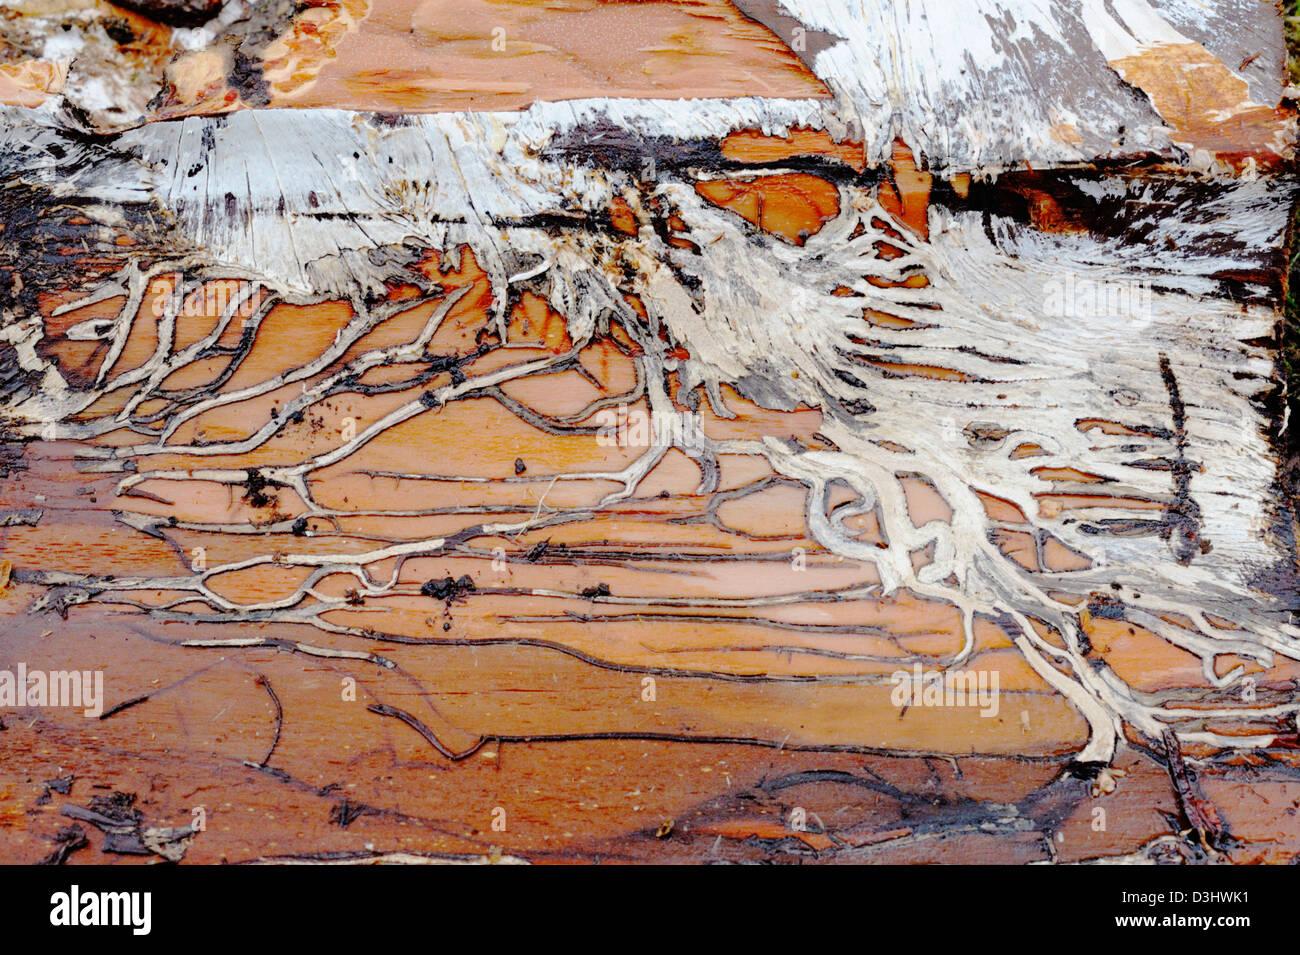 Fungal mycelium patterns on tree bark. - Stock Image